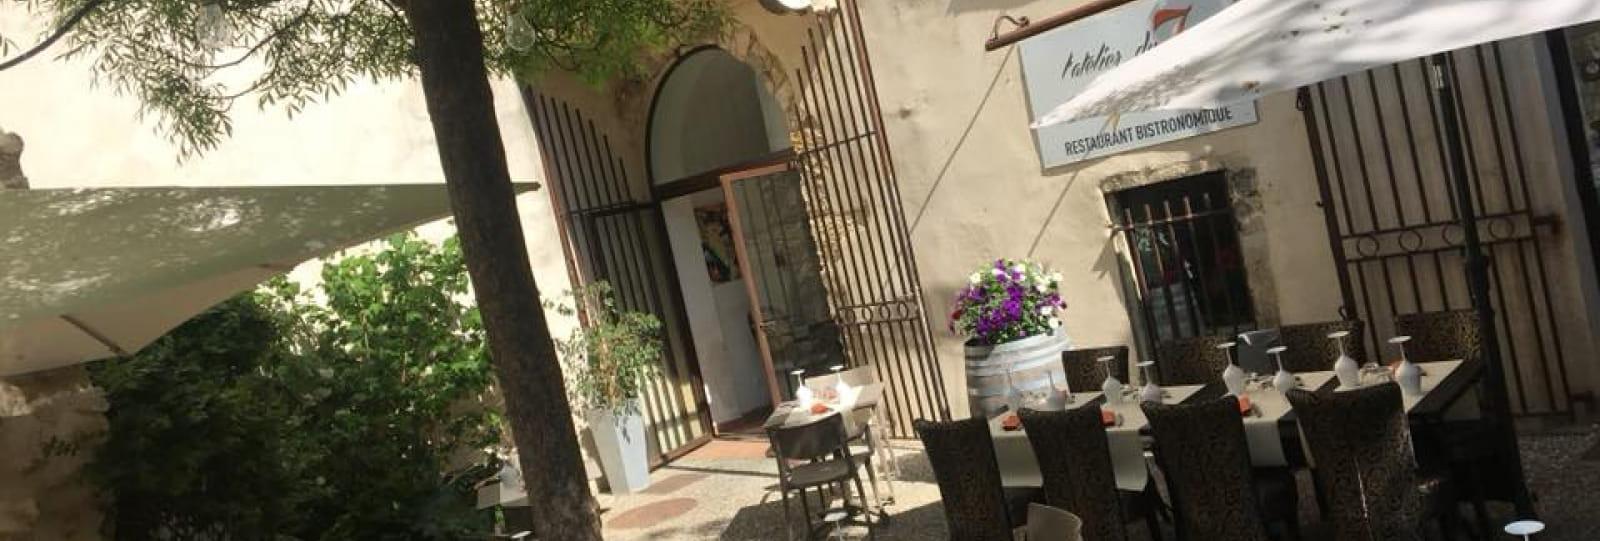 Restaurant L'Atelier du 7